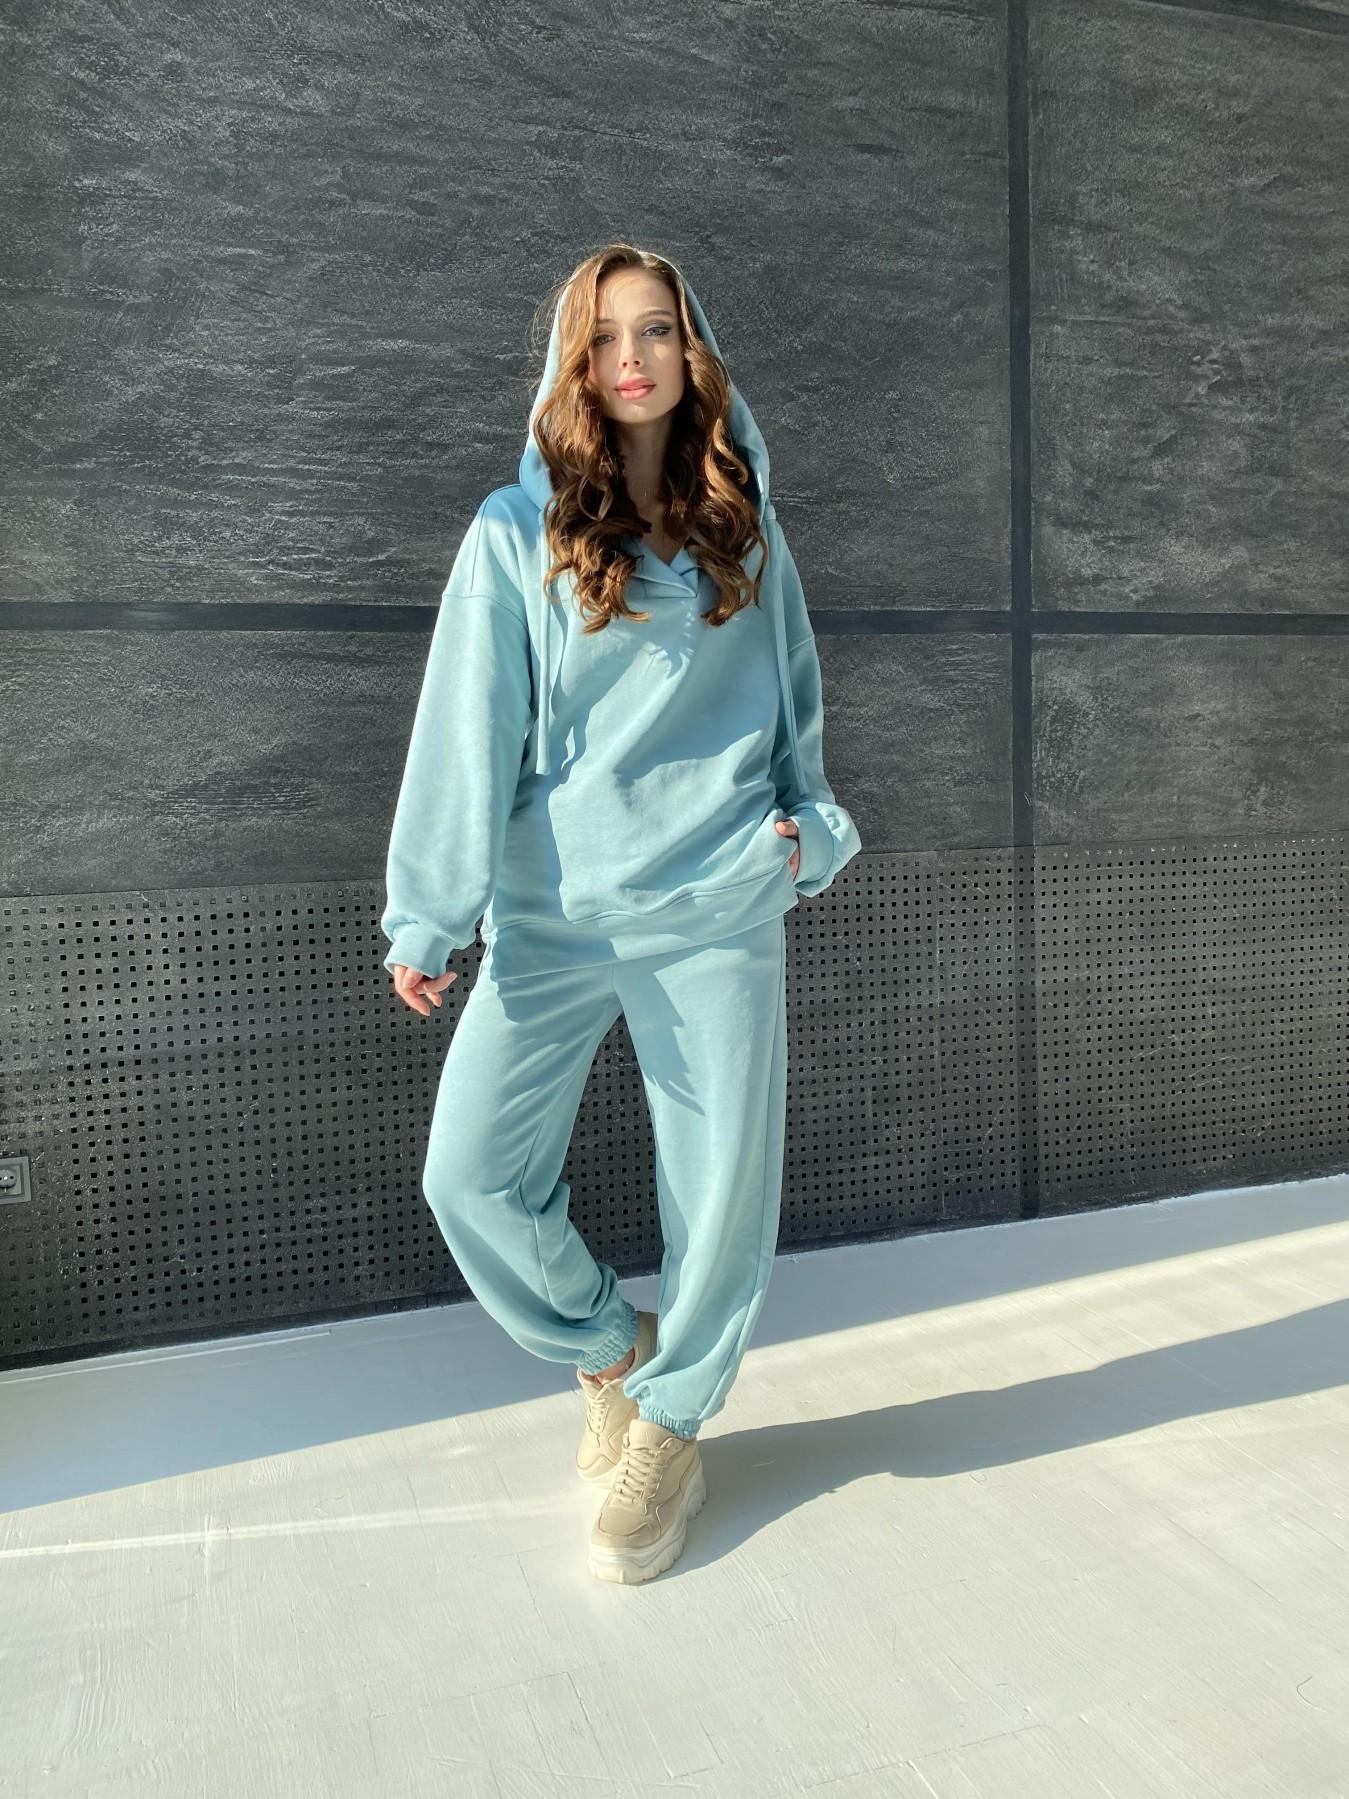 Ярис костюм из 3х нитки 10789 АРТ. 47264 Цвет: Олива - фото 6, интернет магазин tm-modus.ru